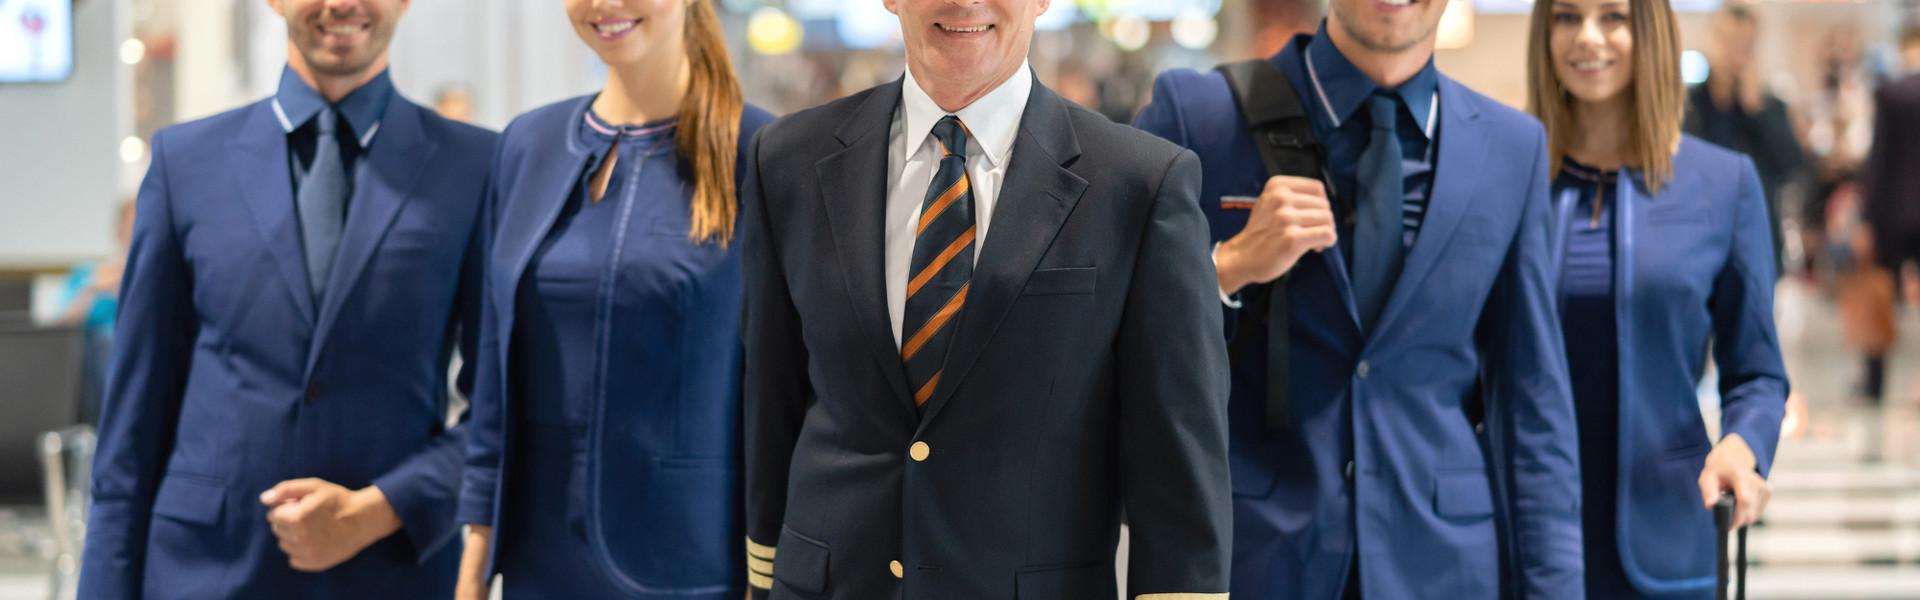 Airline Employee Hotel Deals Near Disney World -